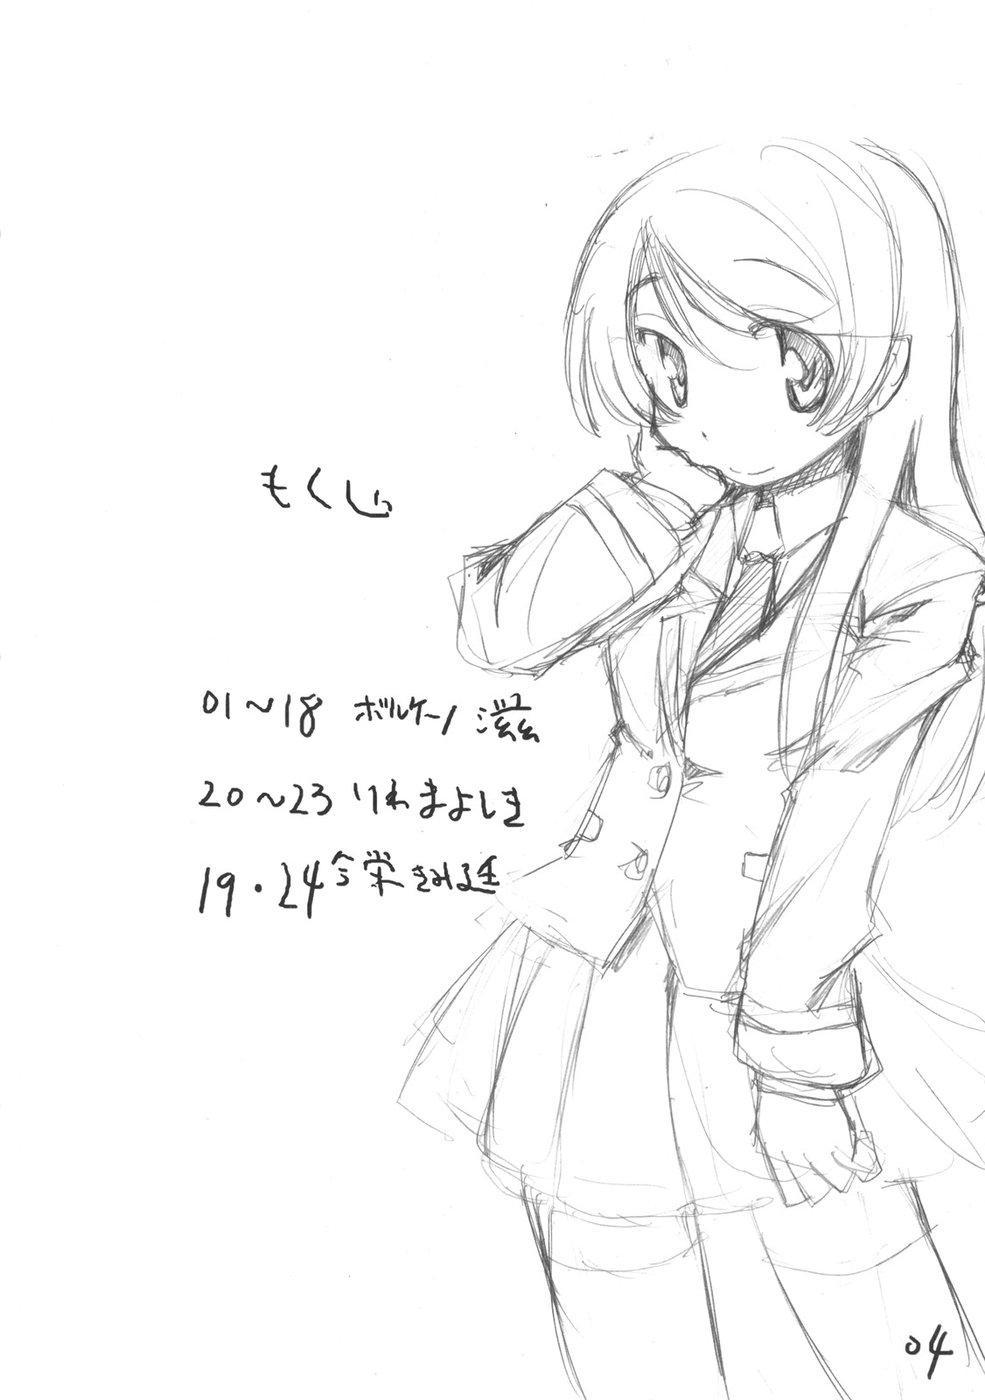 Kocchi no Murasaki 2